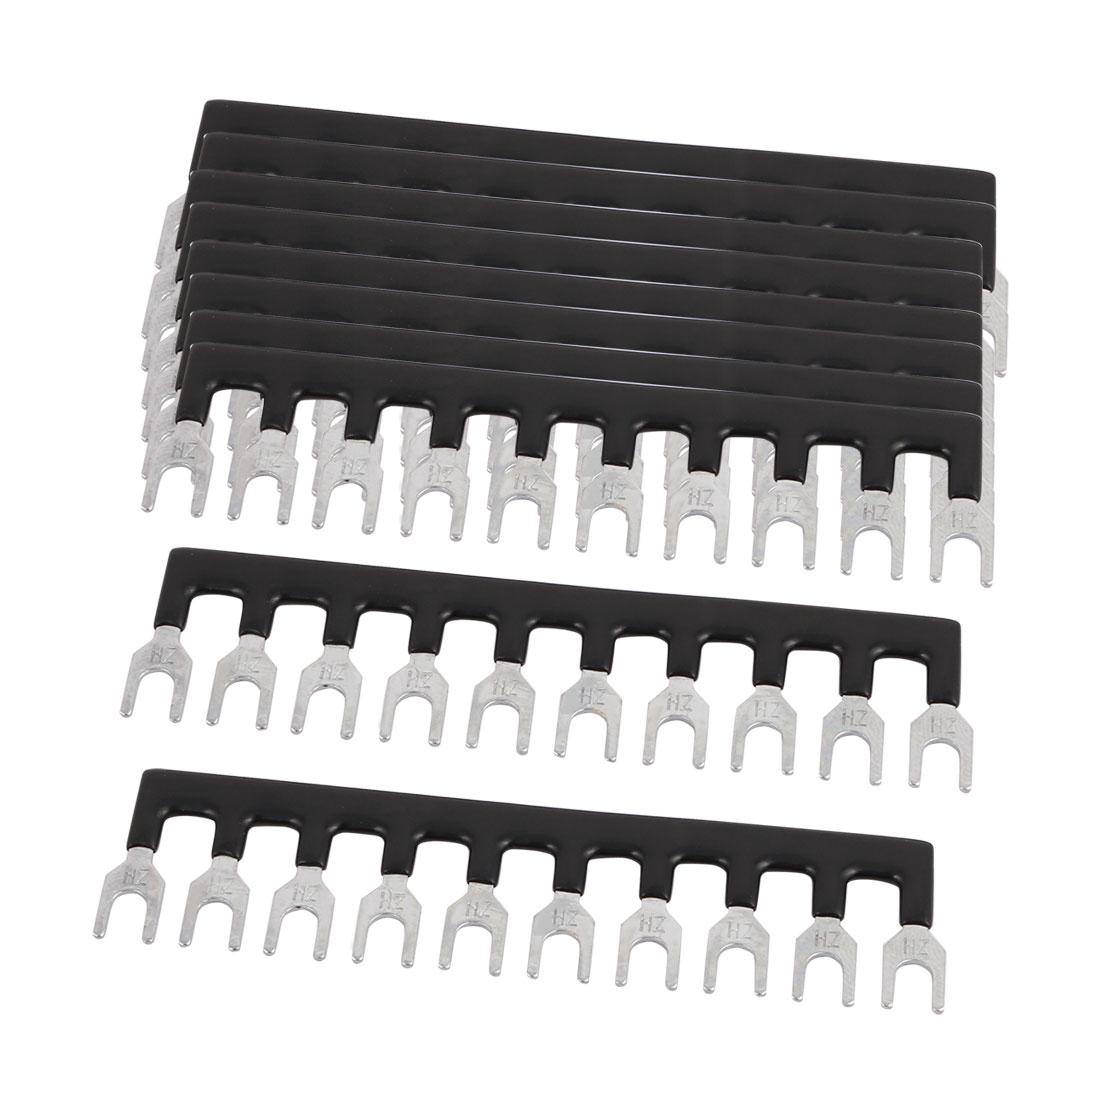 10PCS TBC-10A 5mm Pitch 10 Position PCB Screw Terminal Strip Barrier Black